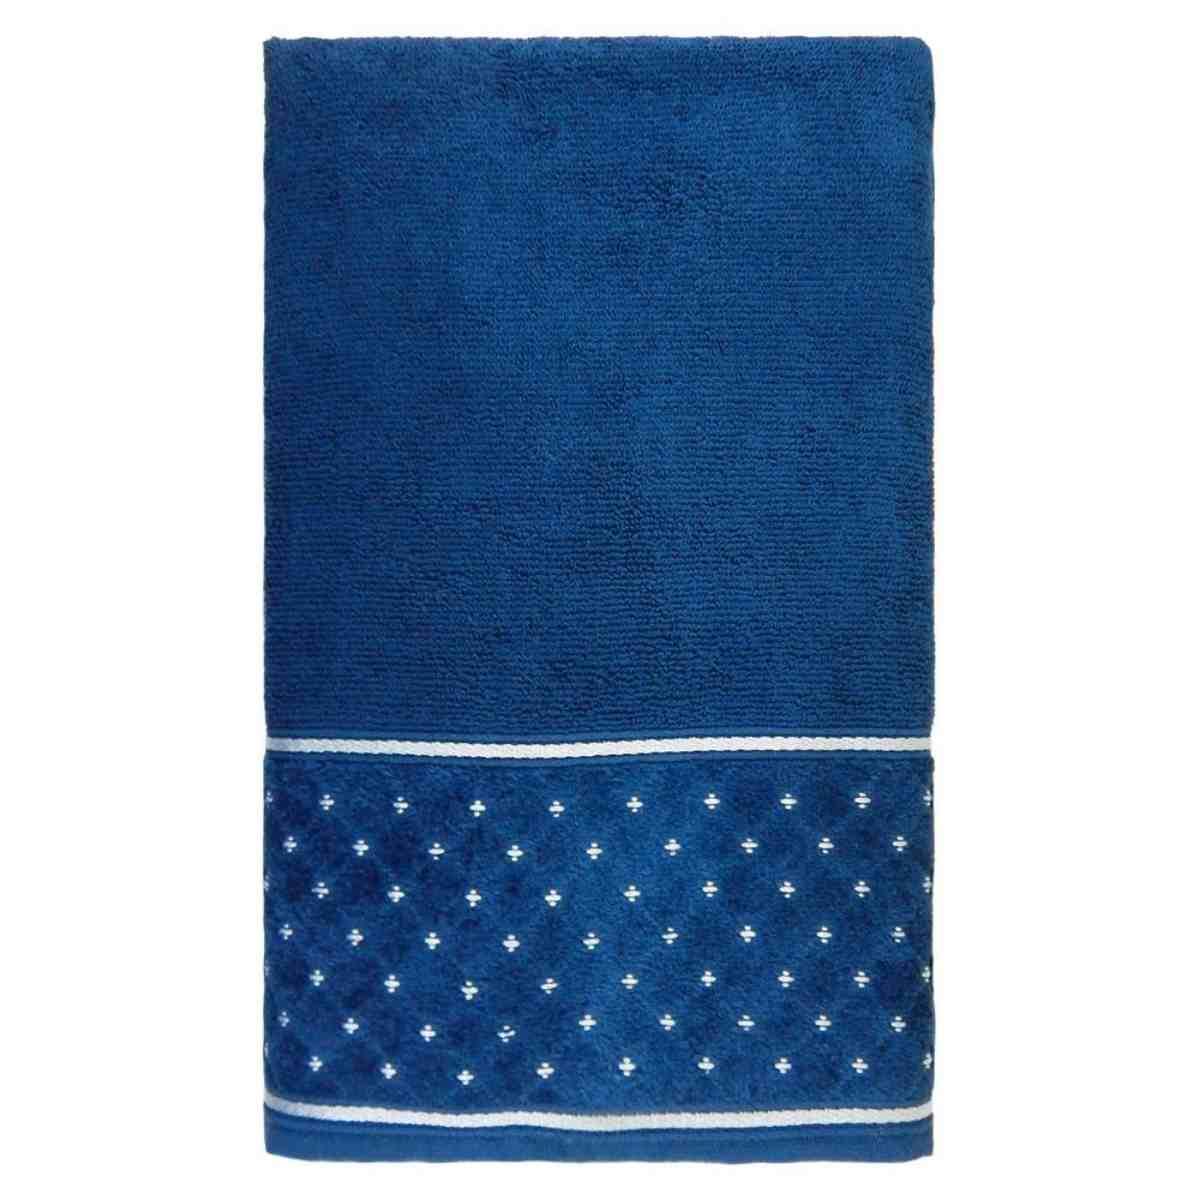 Toalha rosto safira 50x75 Azul Profundo